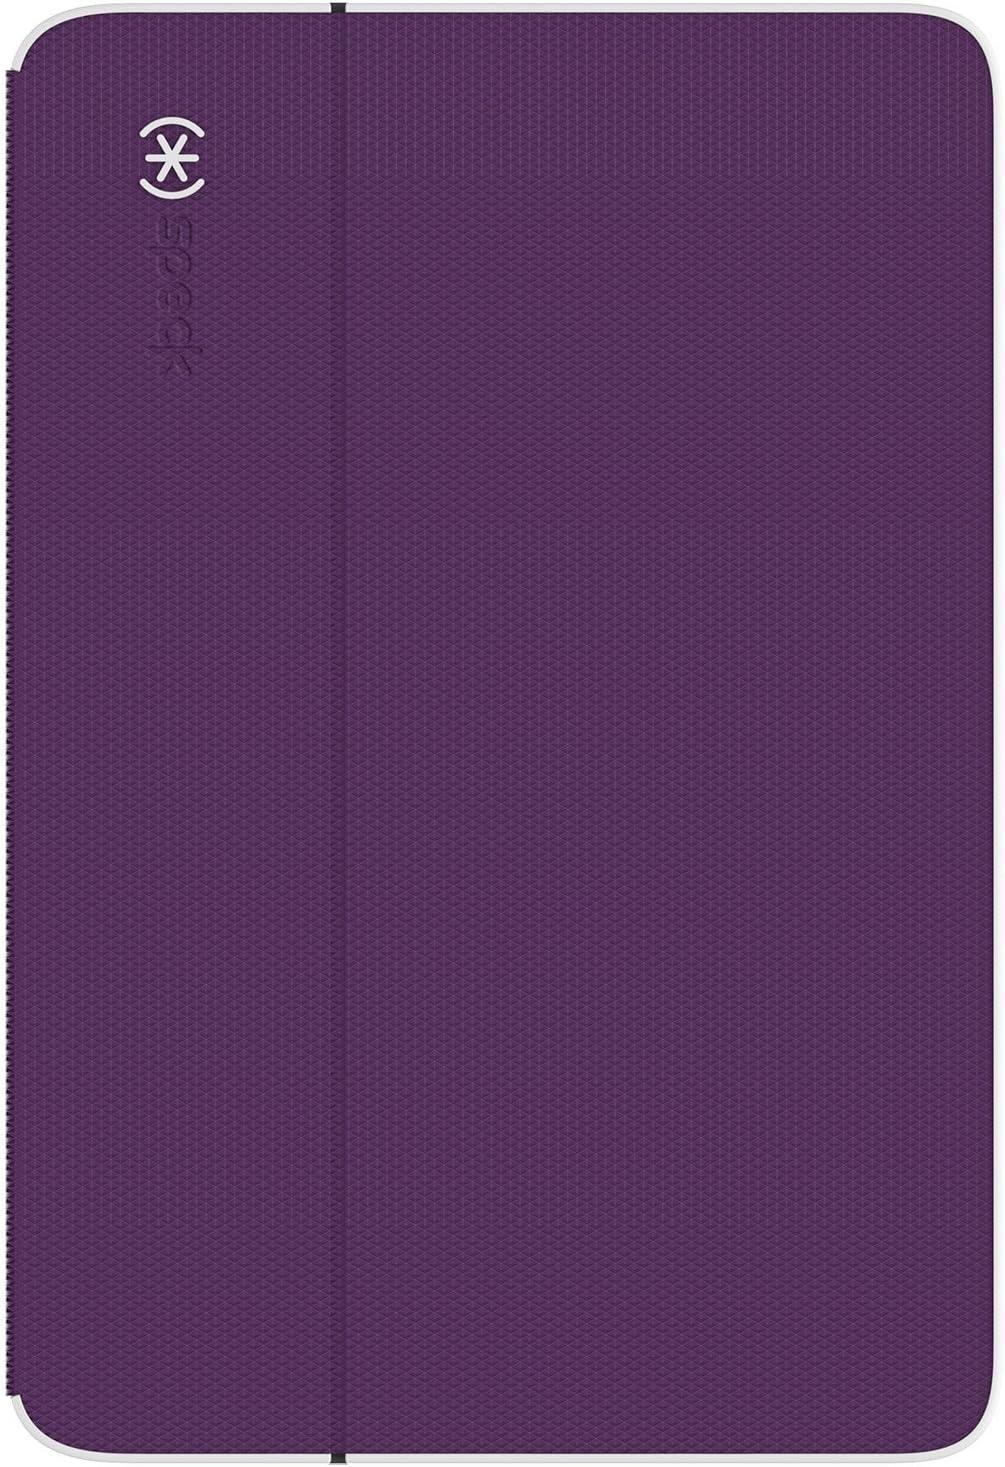 Speck Products DuraFolio Case and Stand for iPad Mini 4, Acai Purple/White/Slate Grey (73884-5075)